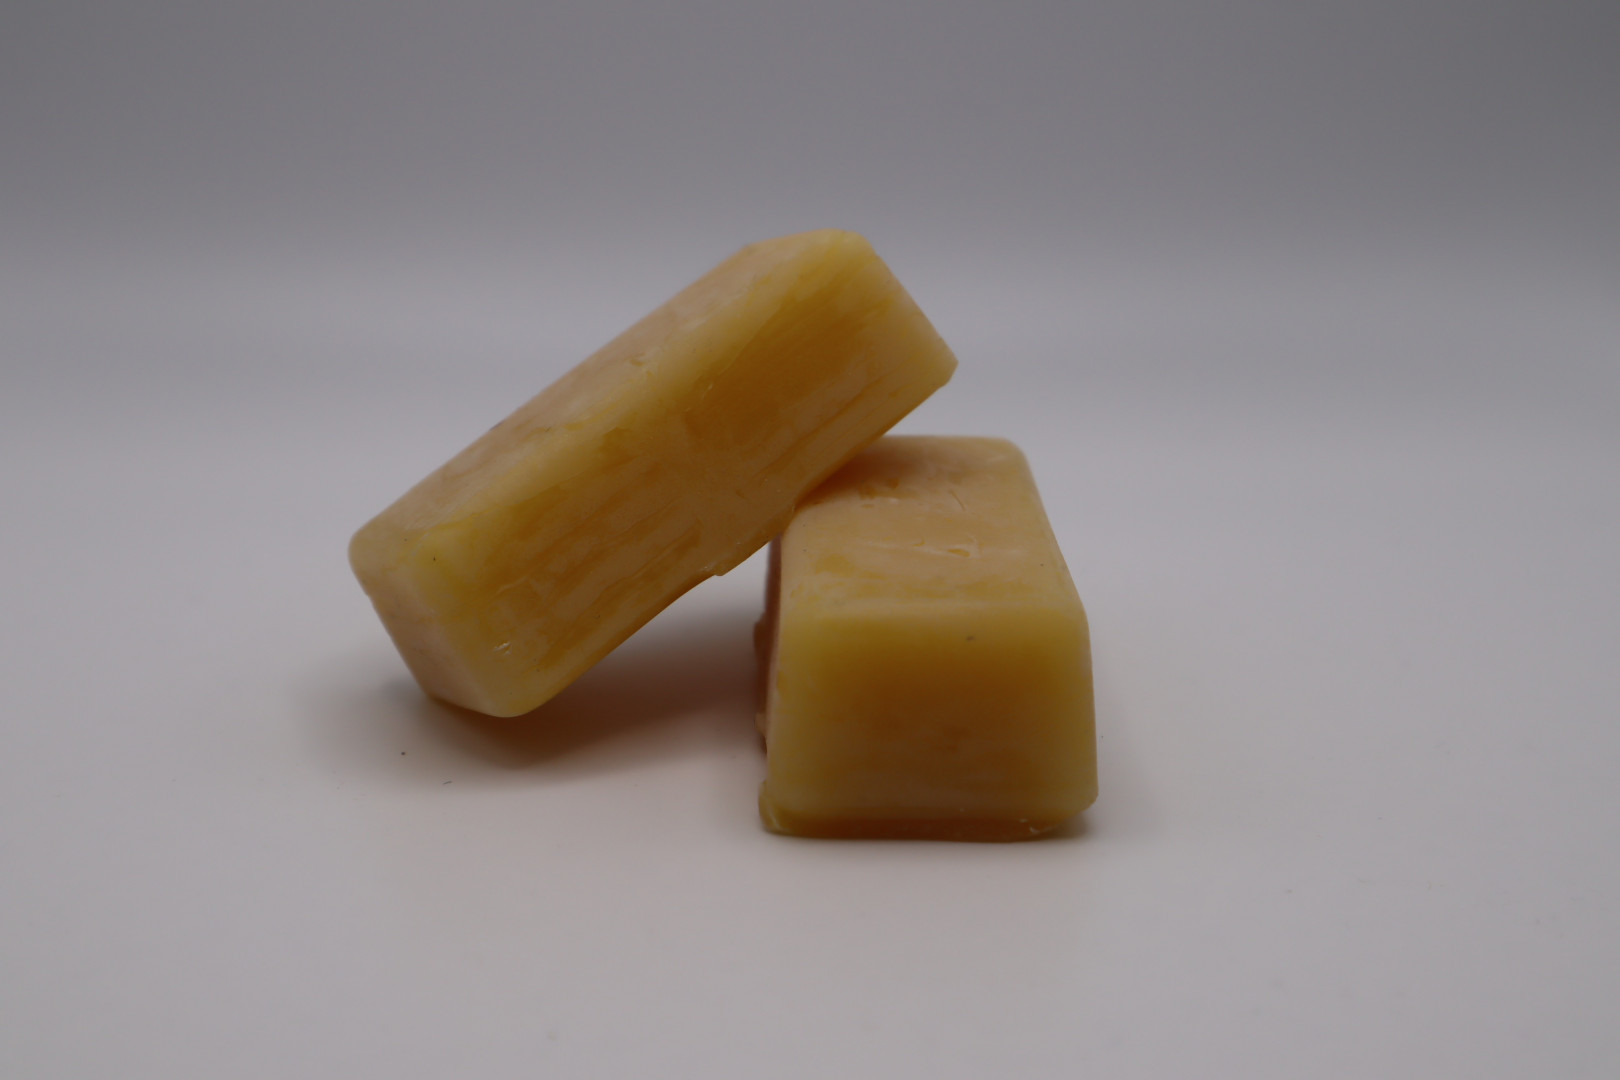 1-oz Pure Beeswax